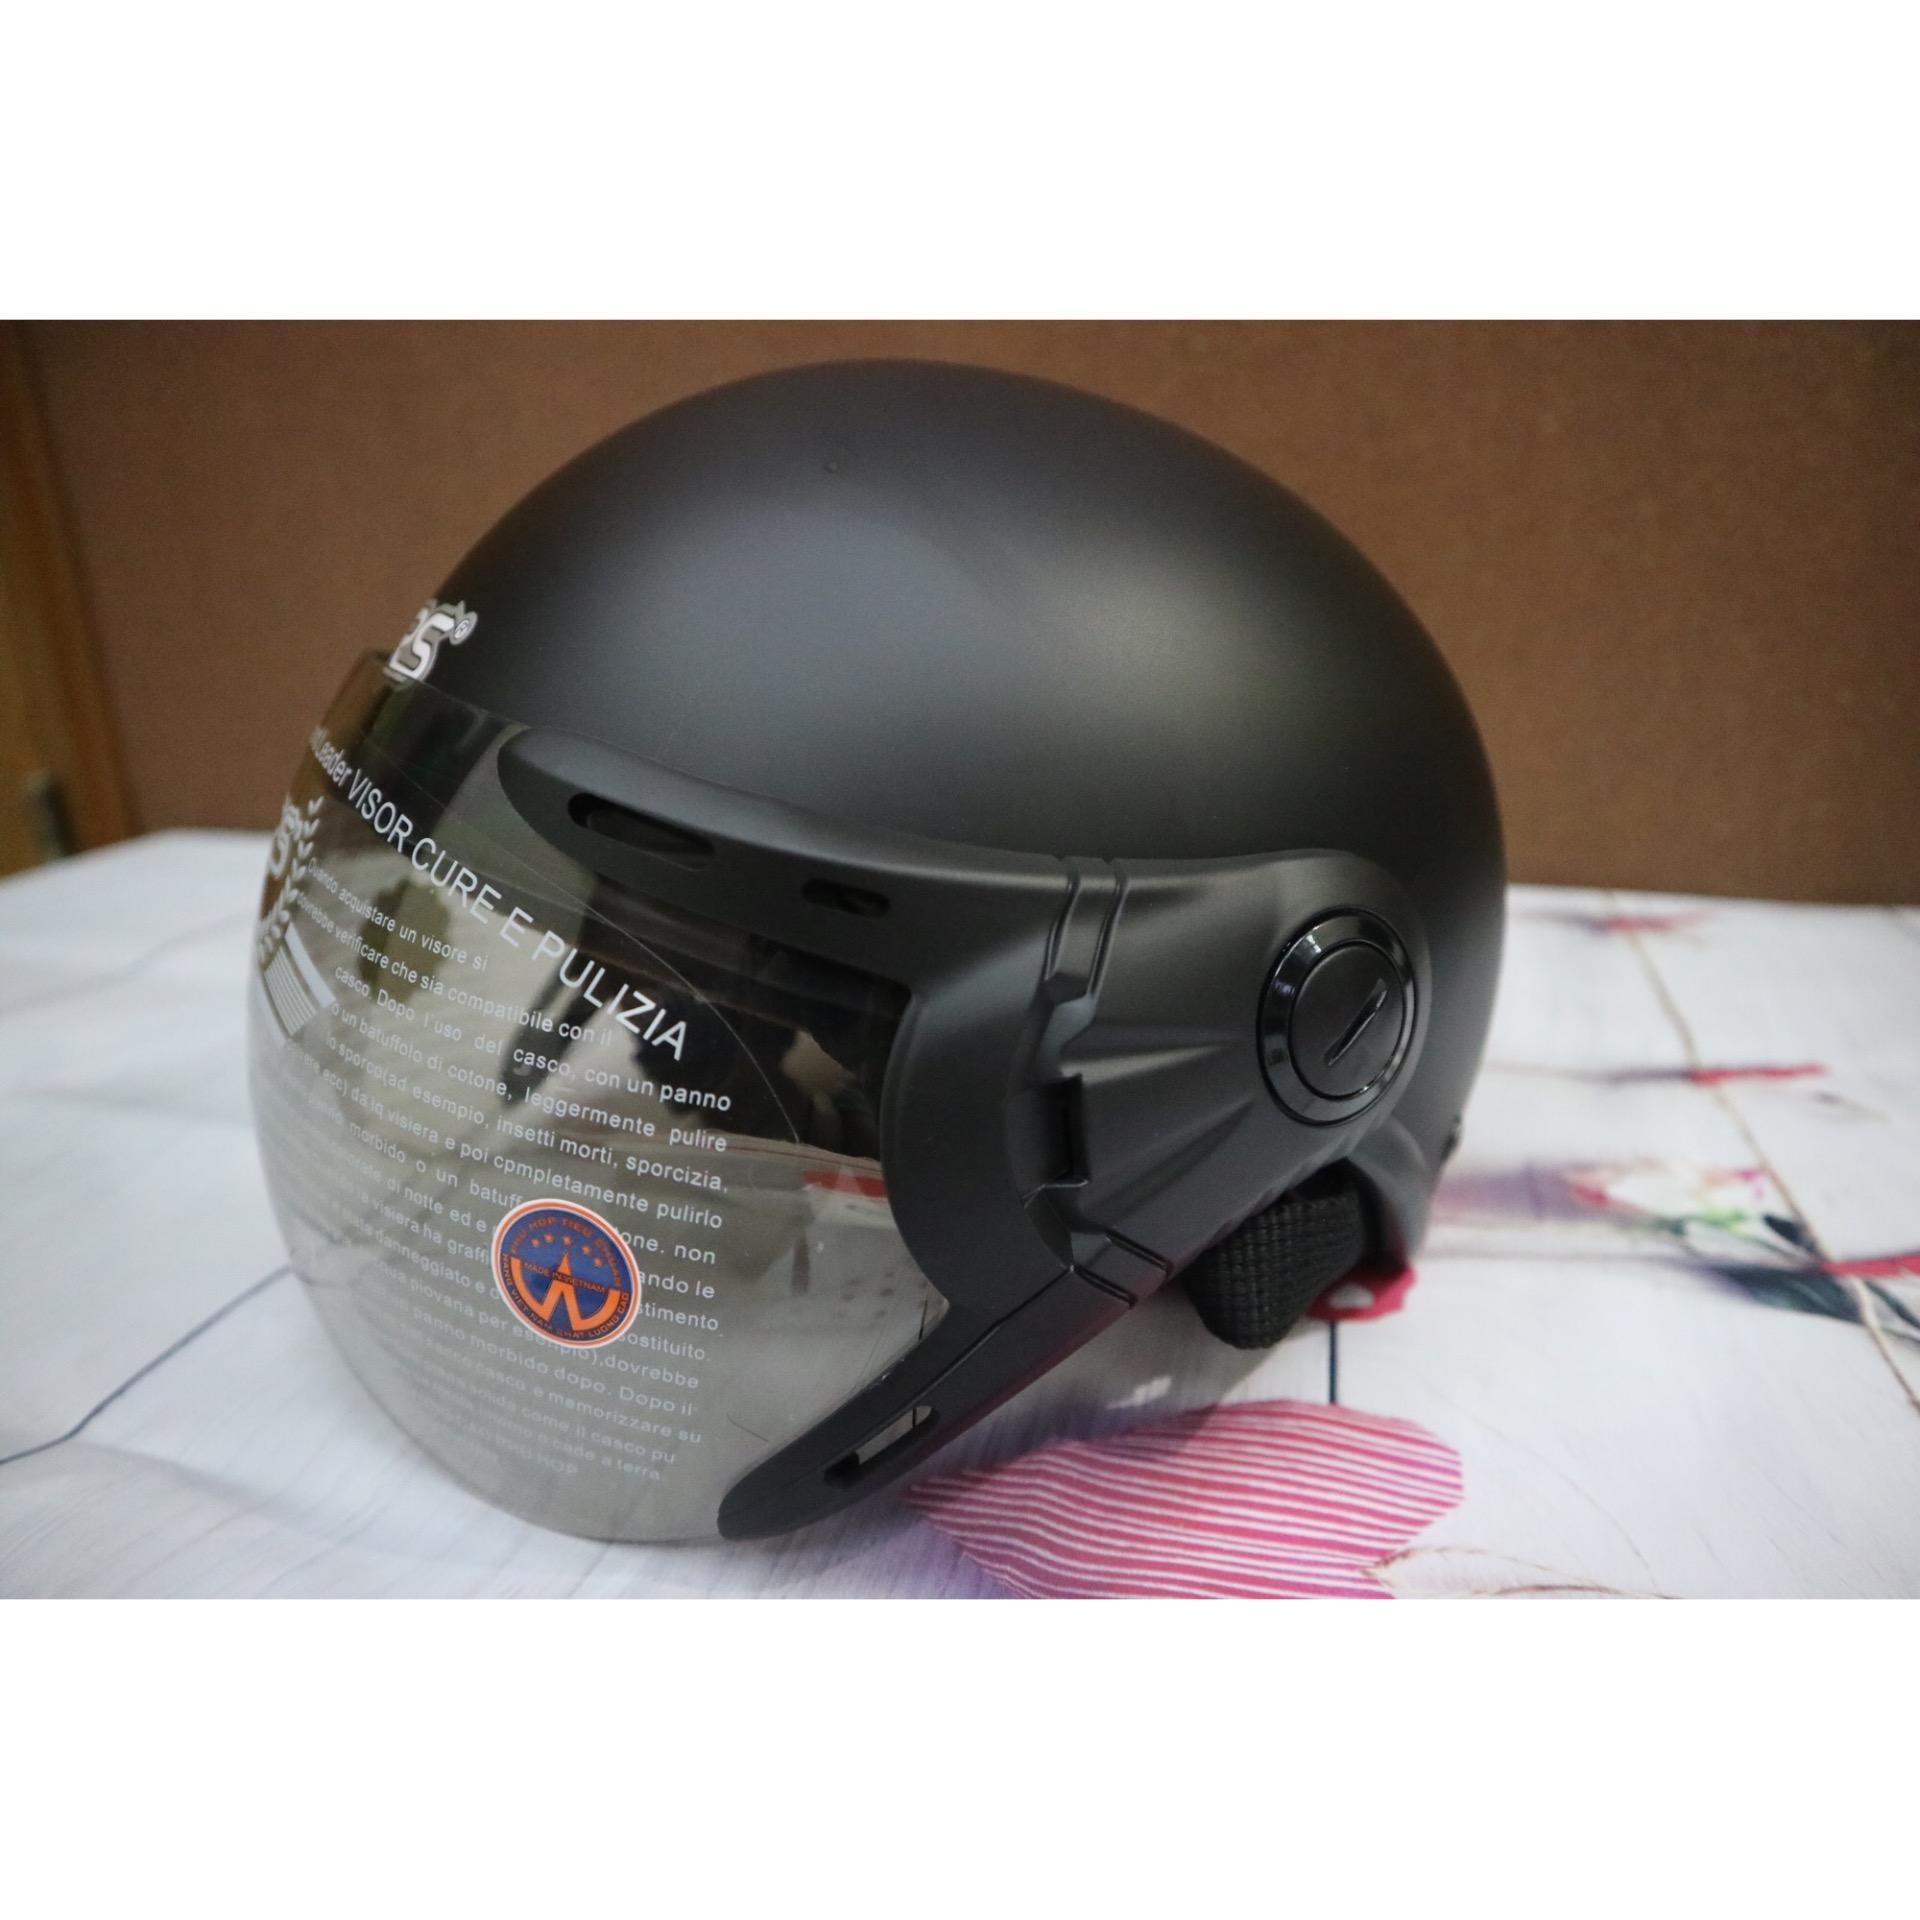 Mũ bảo hiểm GRS A33k (đen nhám) Nhật Bản